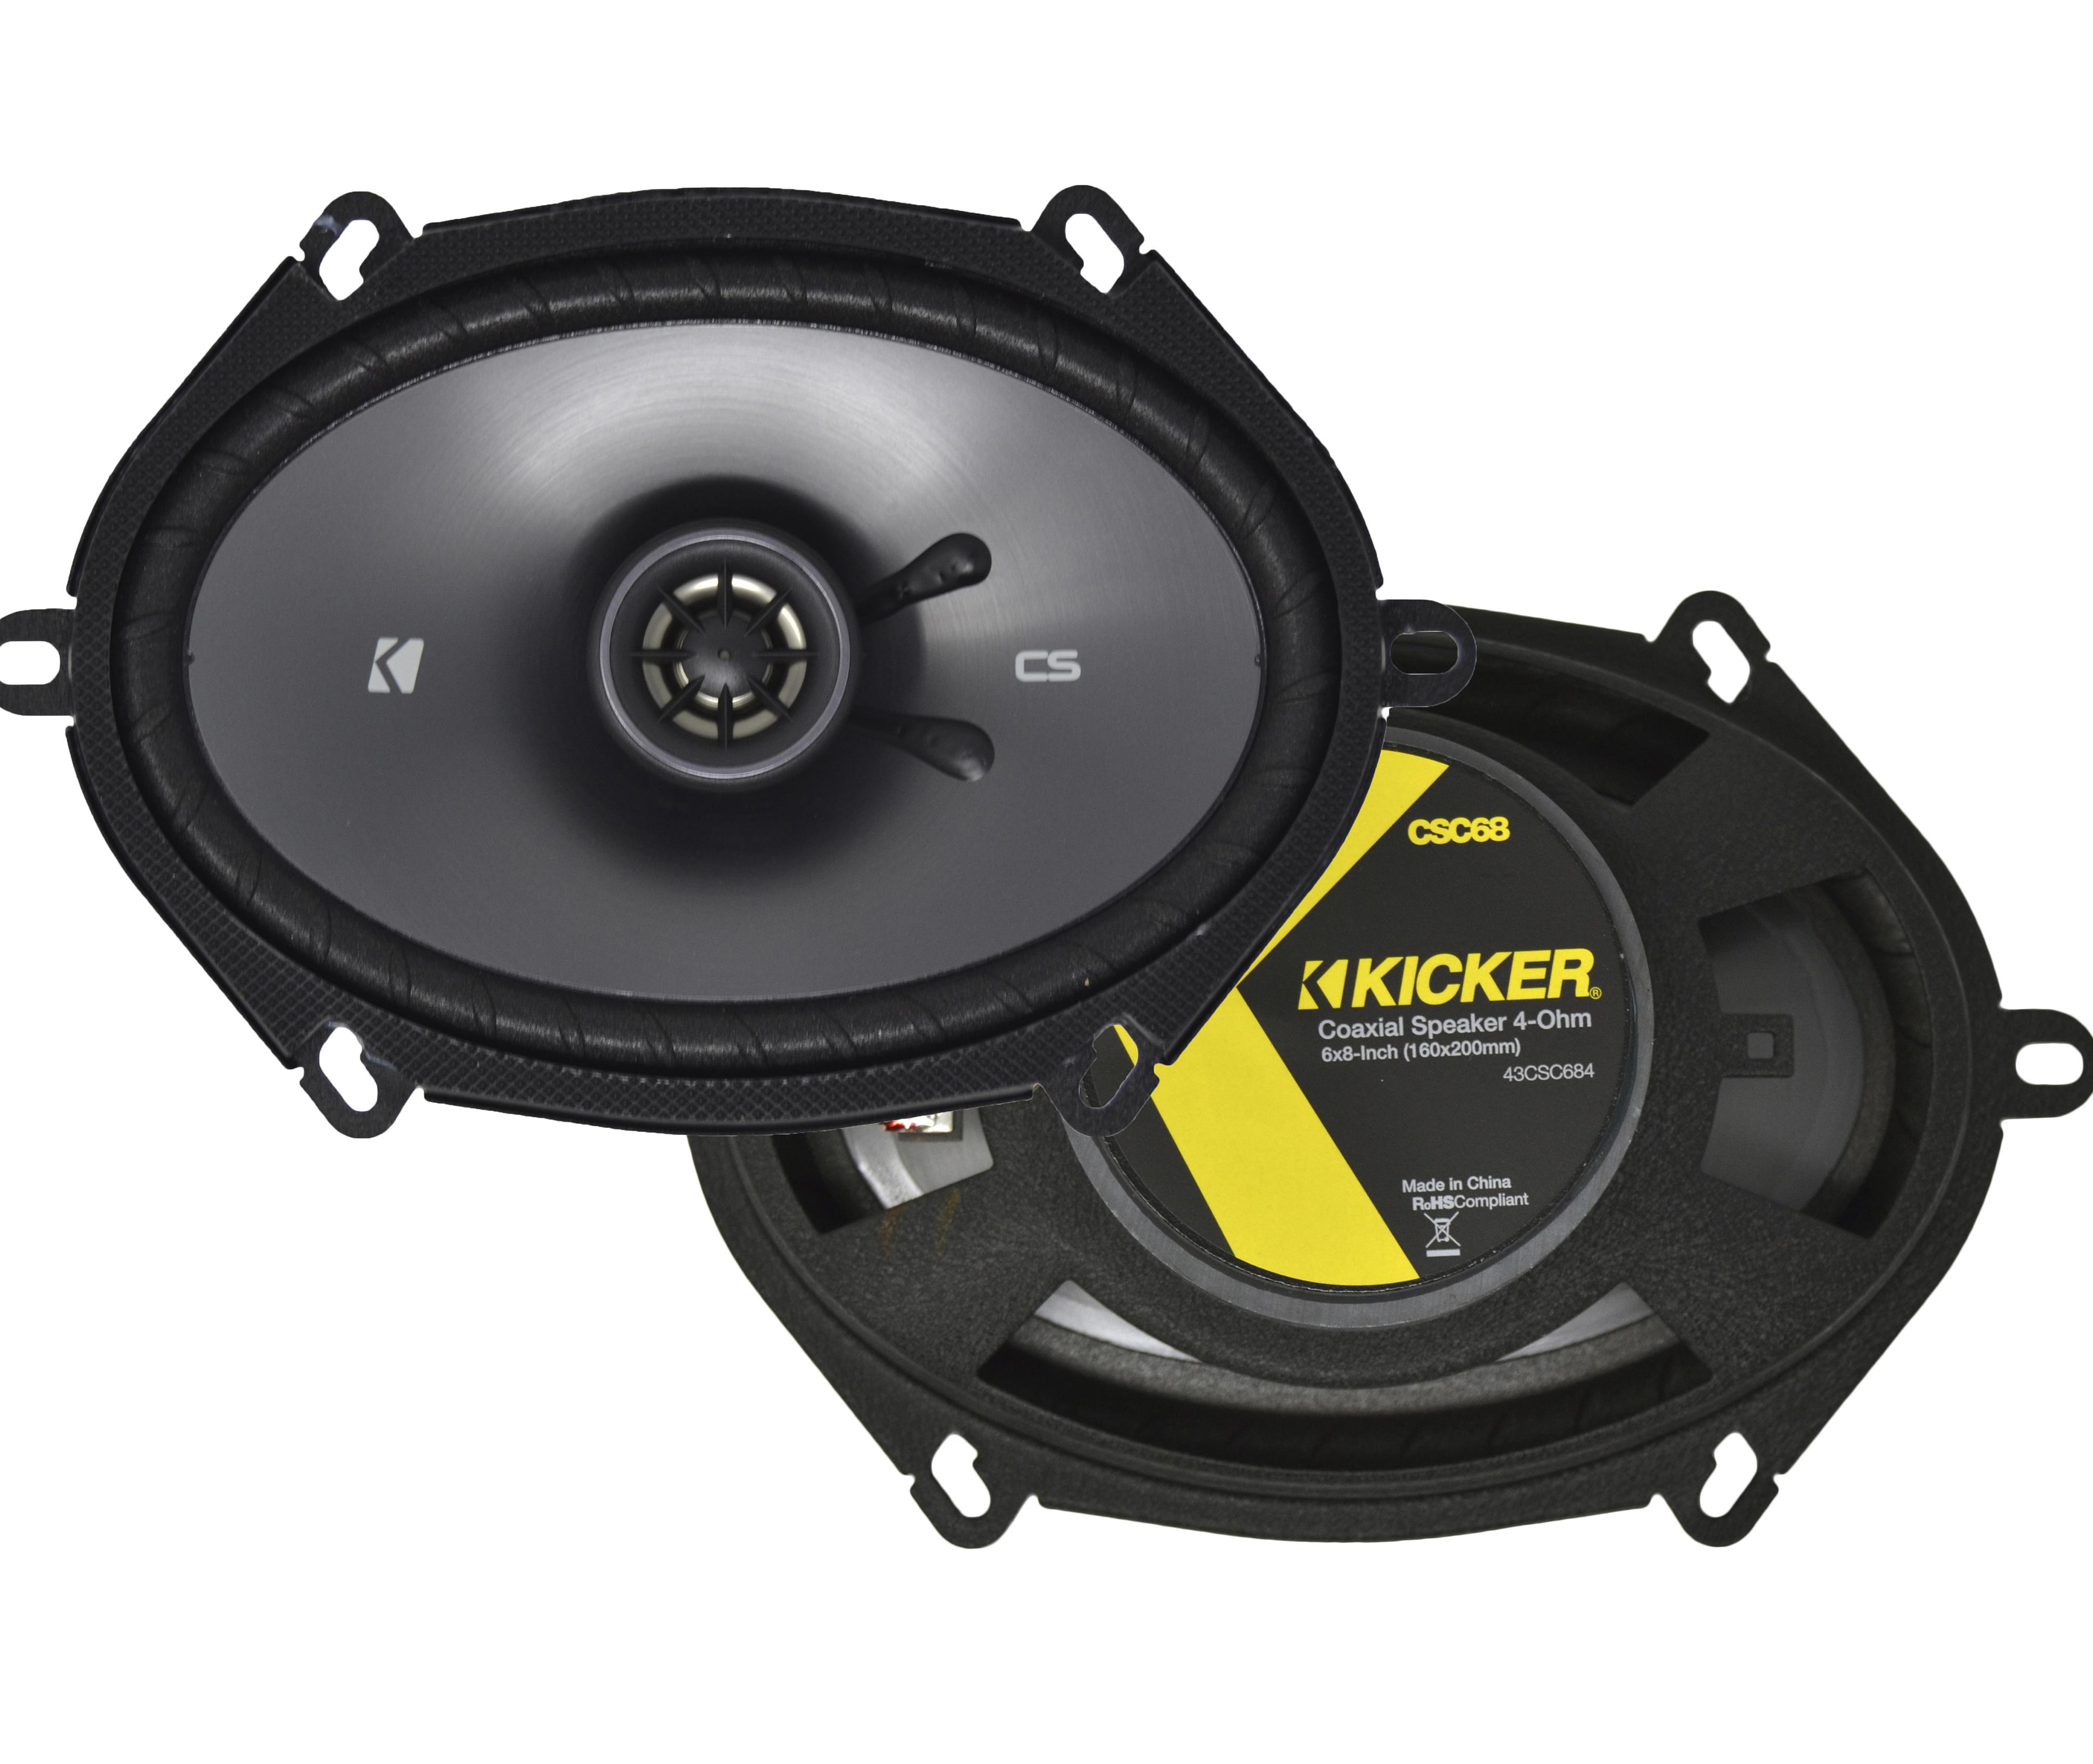 "Kicker CS Series 6x8/"" 2-Way 225W Car Audio Speakers 43CSC684 Pair CSC68"